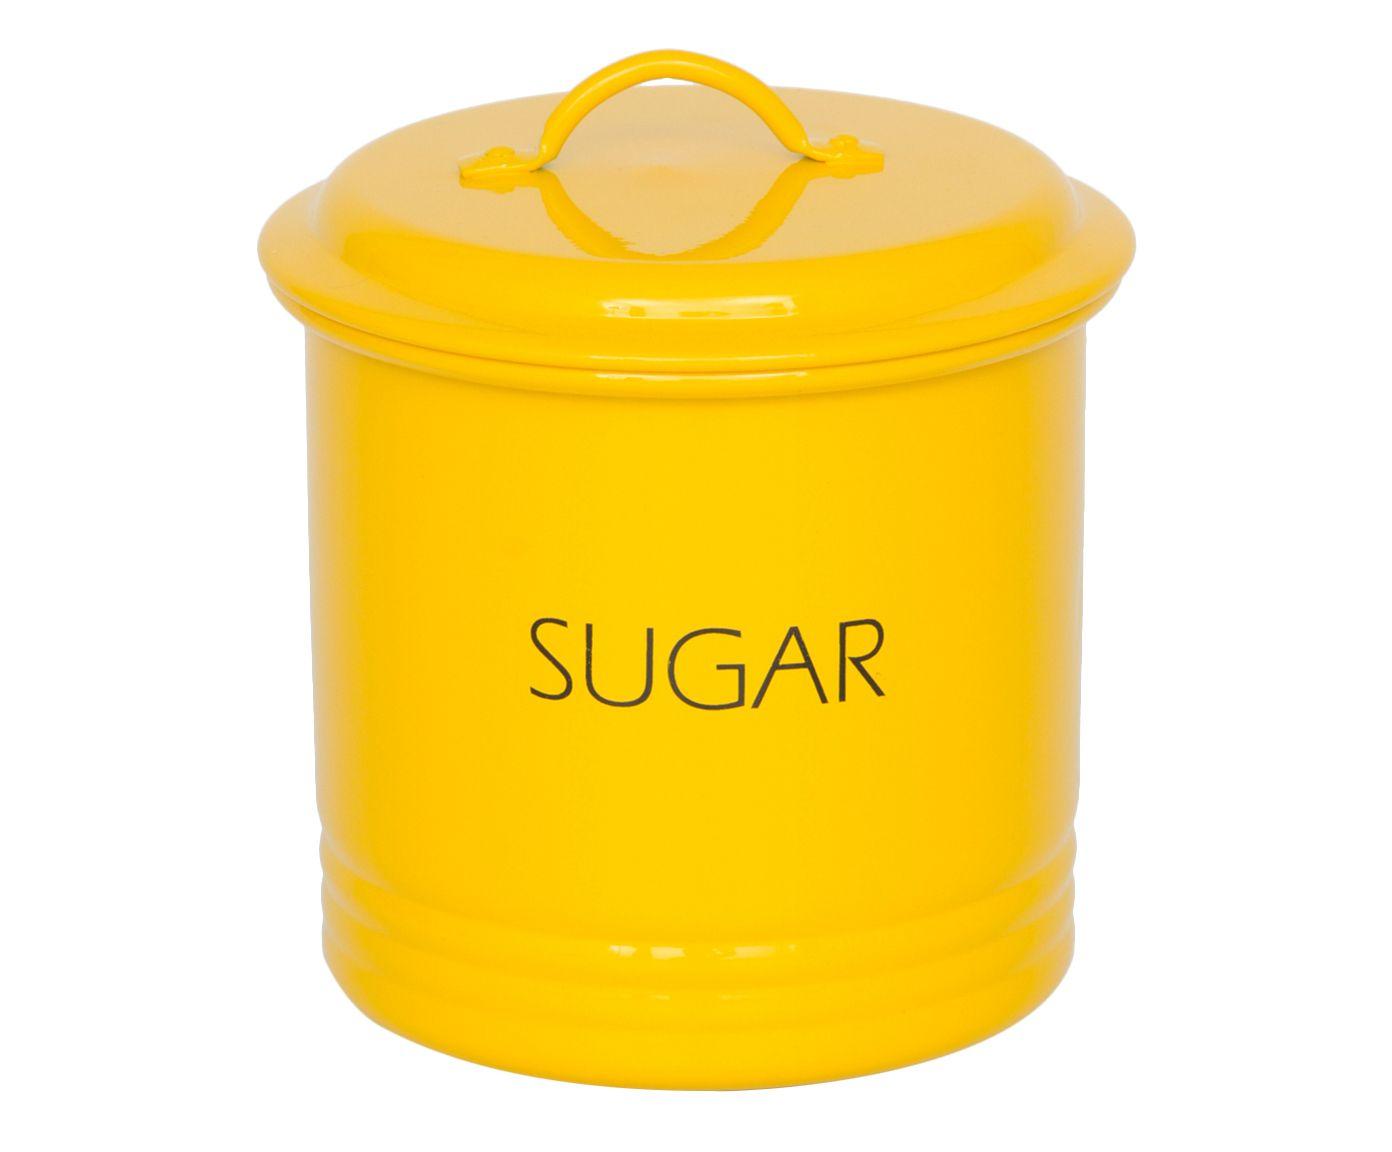 Jogo de Latas Canelas Tea&Sugar - Amarelo | Westwing.com.br